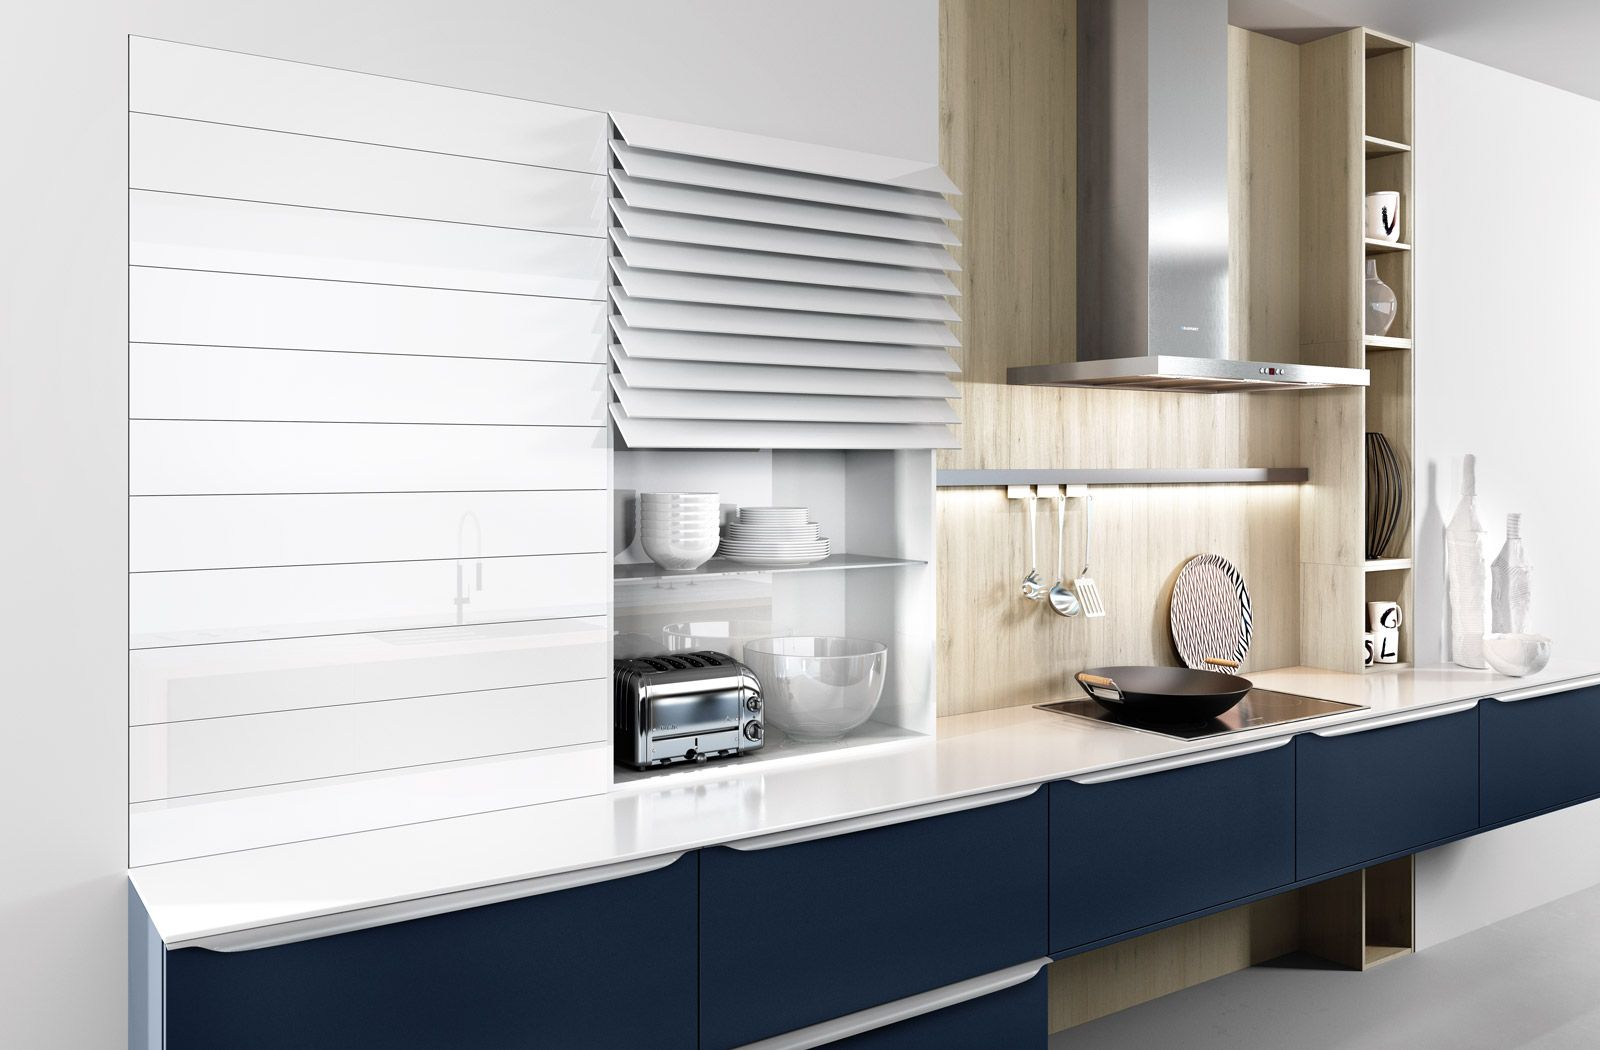 6000 Velvet Blue Lacquer Hacker Kuchen Hacker Kuchen Kitchen Design Small Kitchen Design Small Kitchen Decor